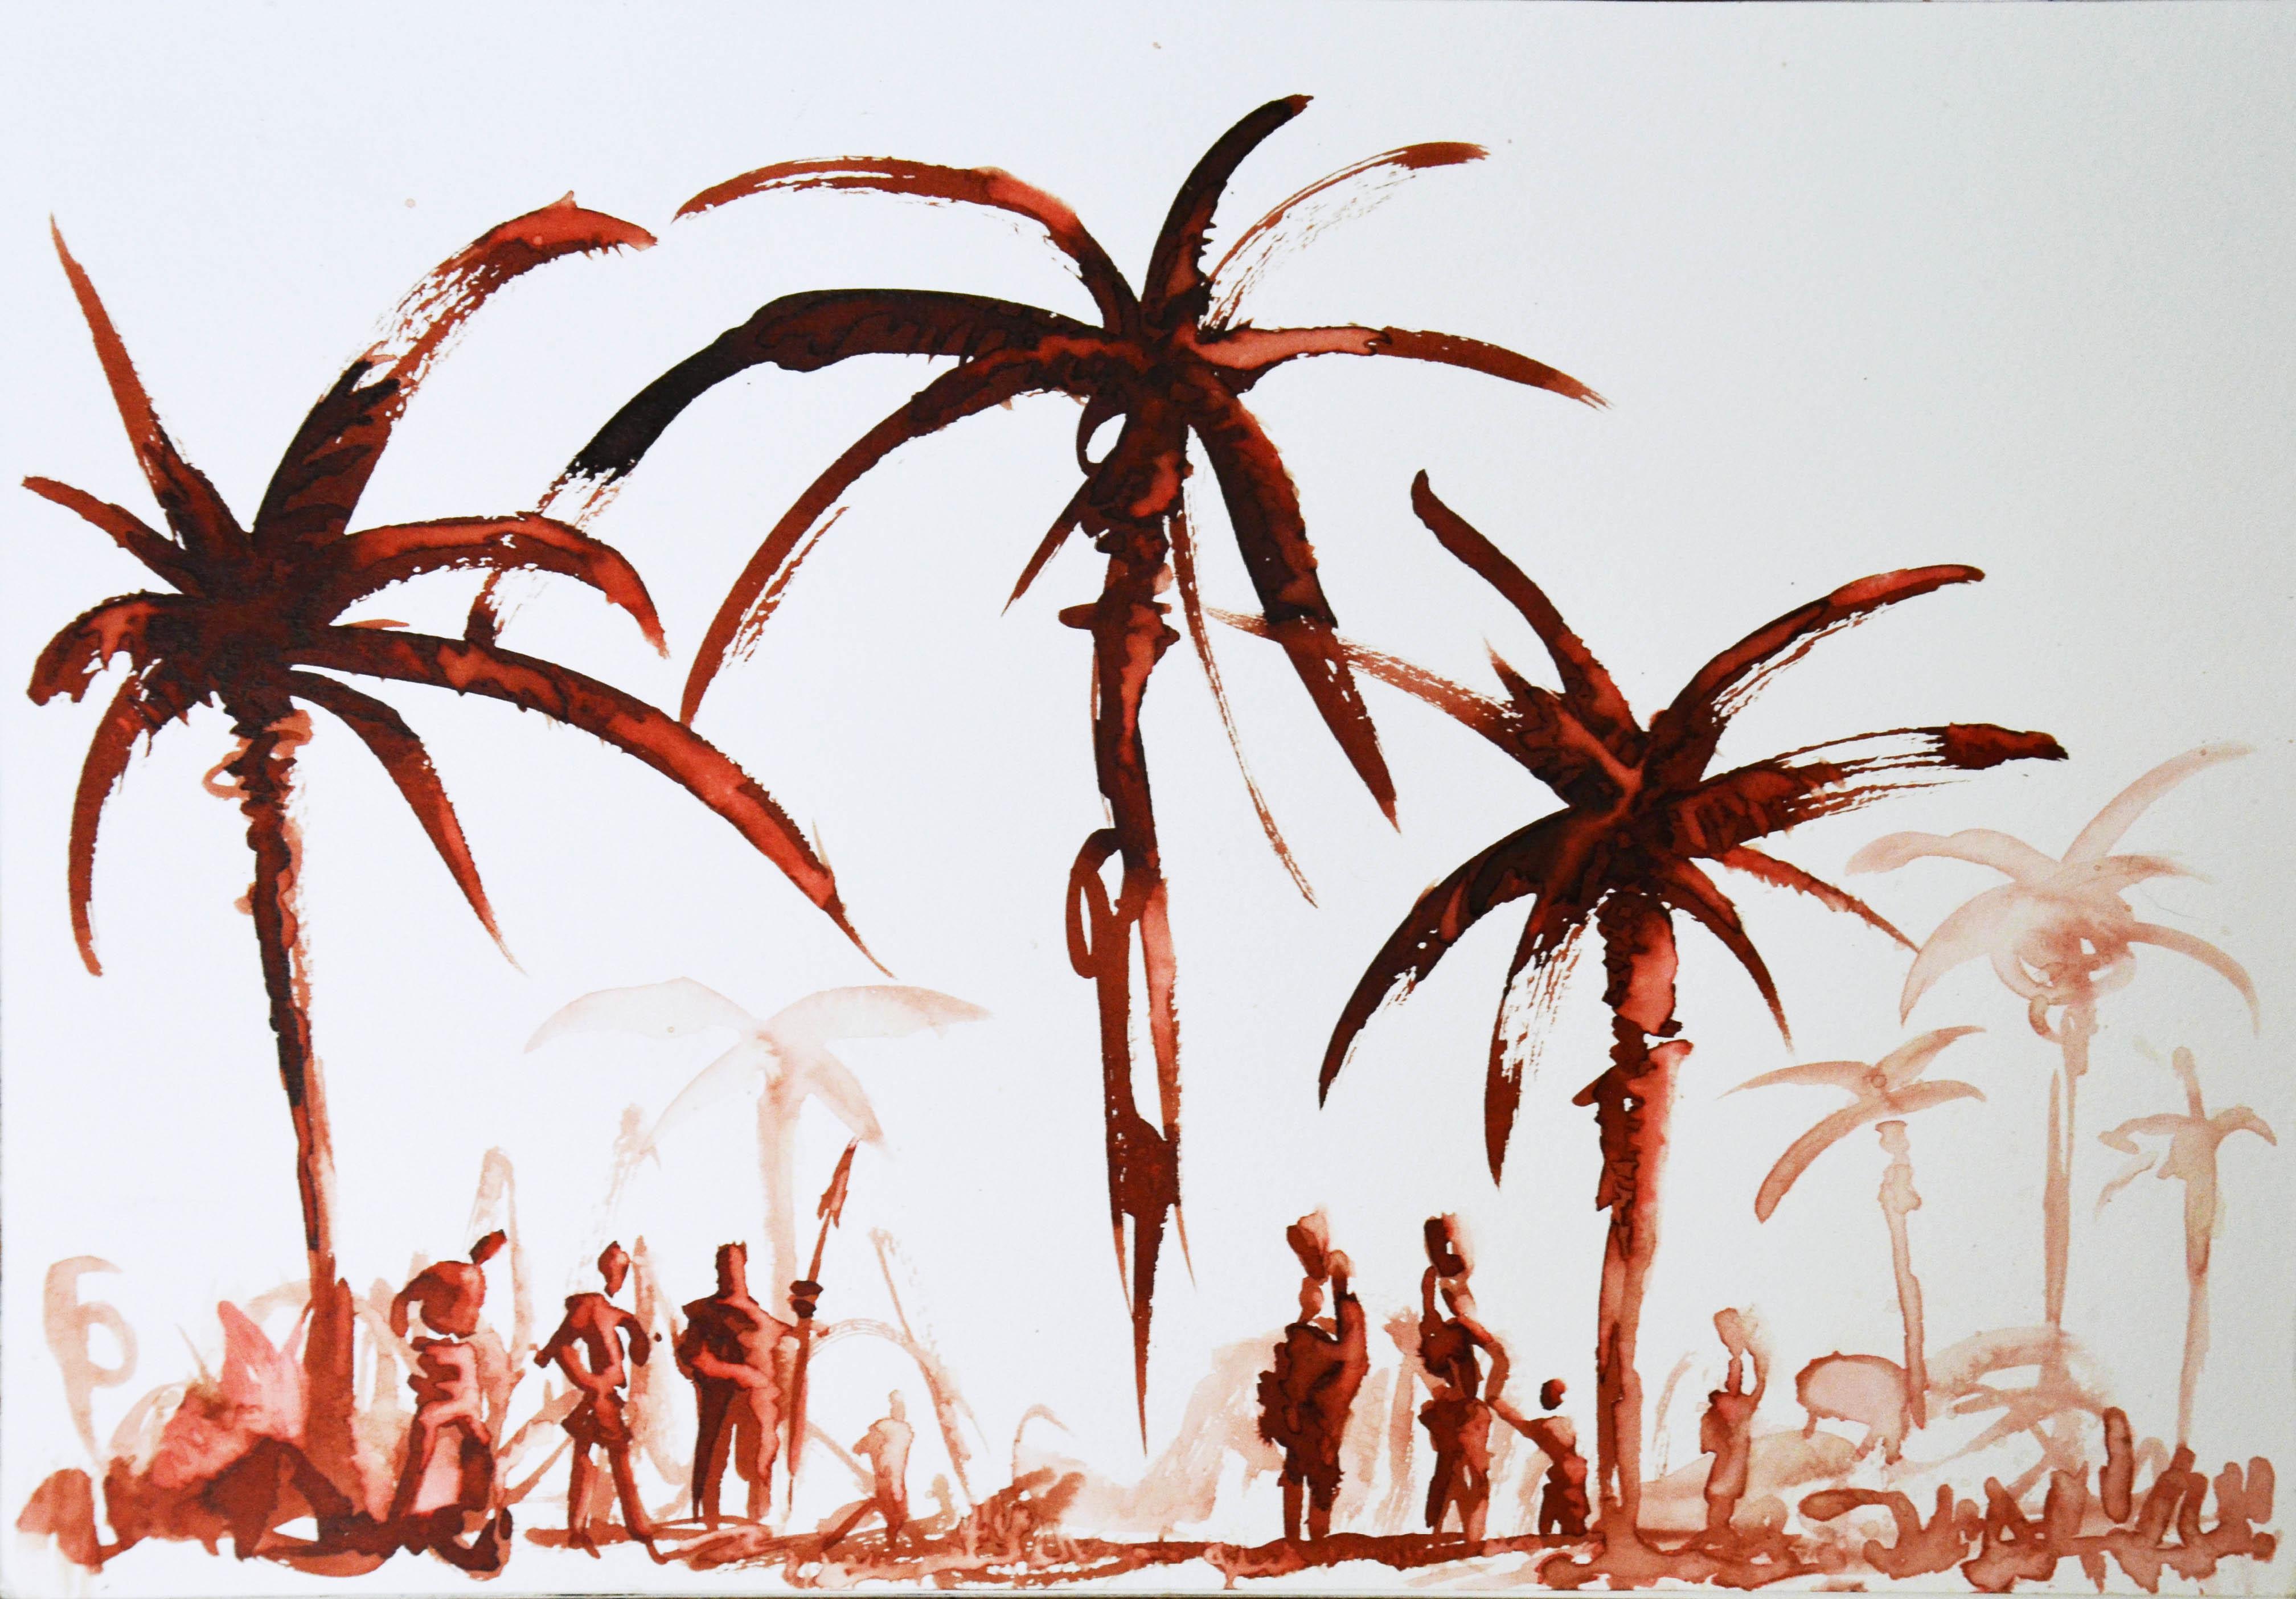 GÉNESIS (2017) - Luis Quintano Navarro